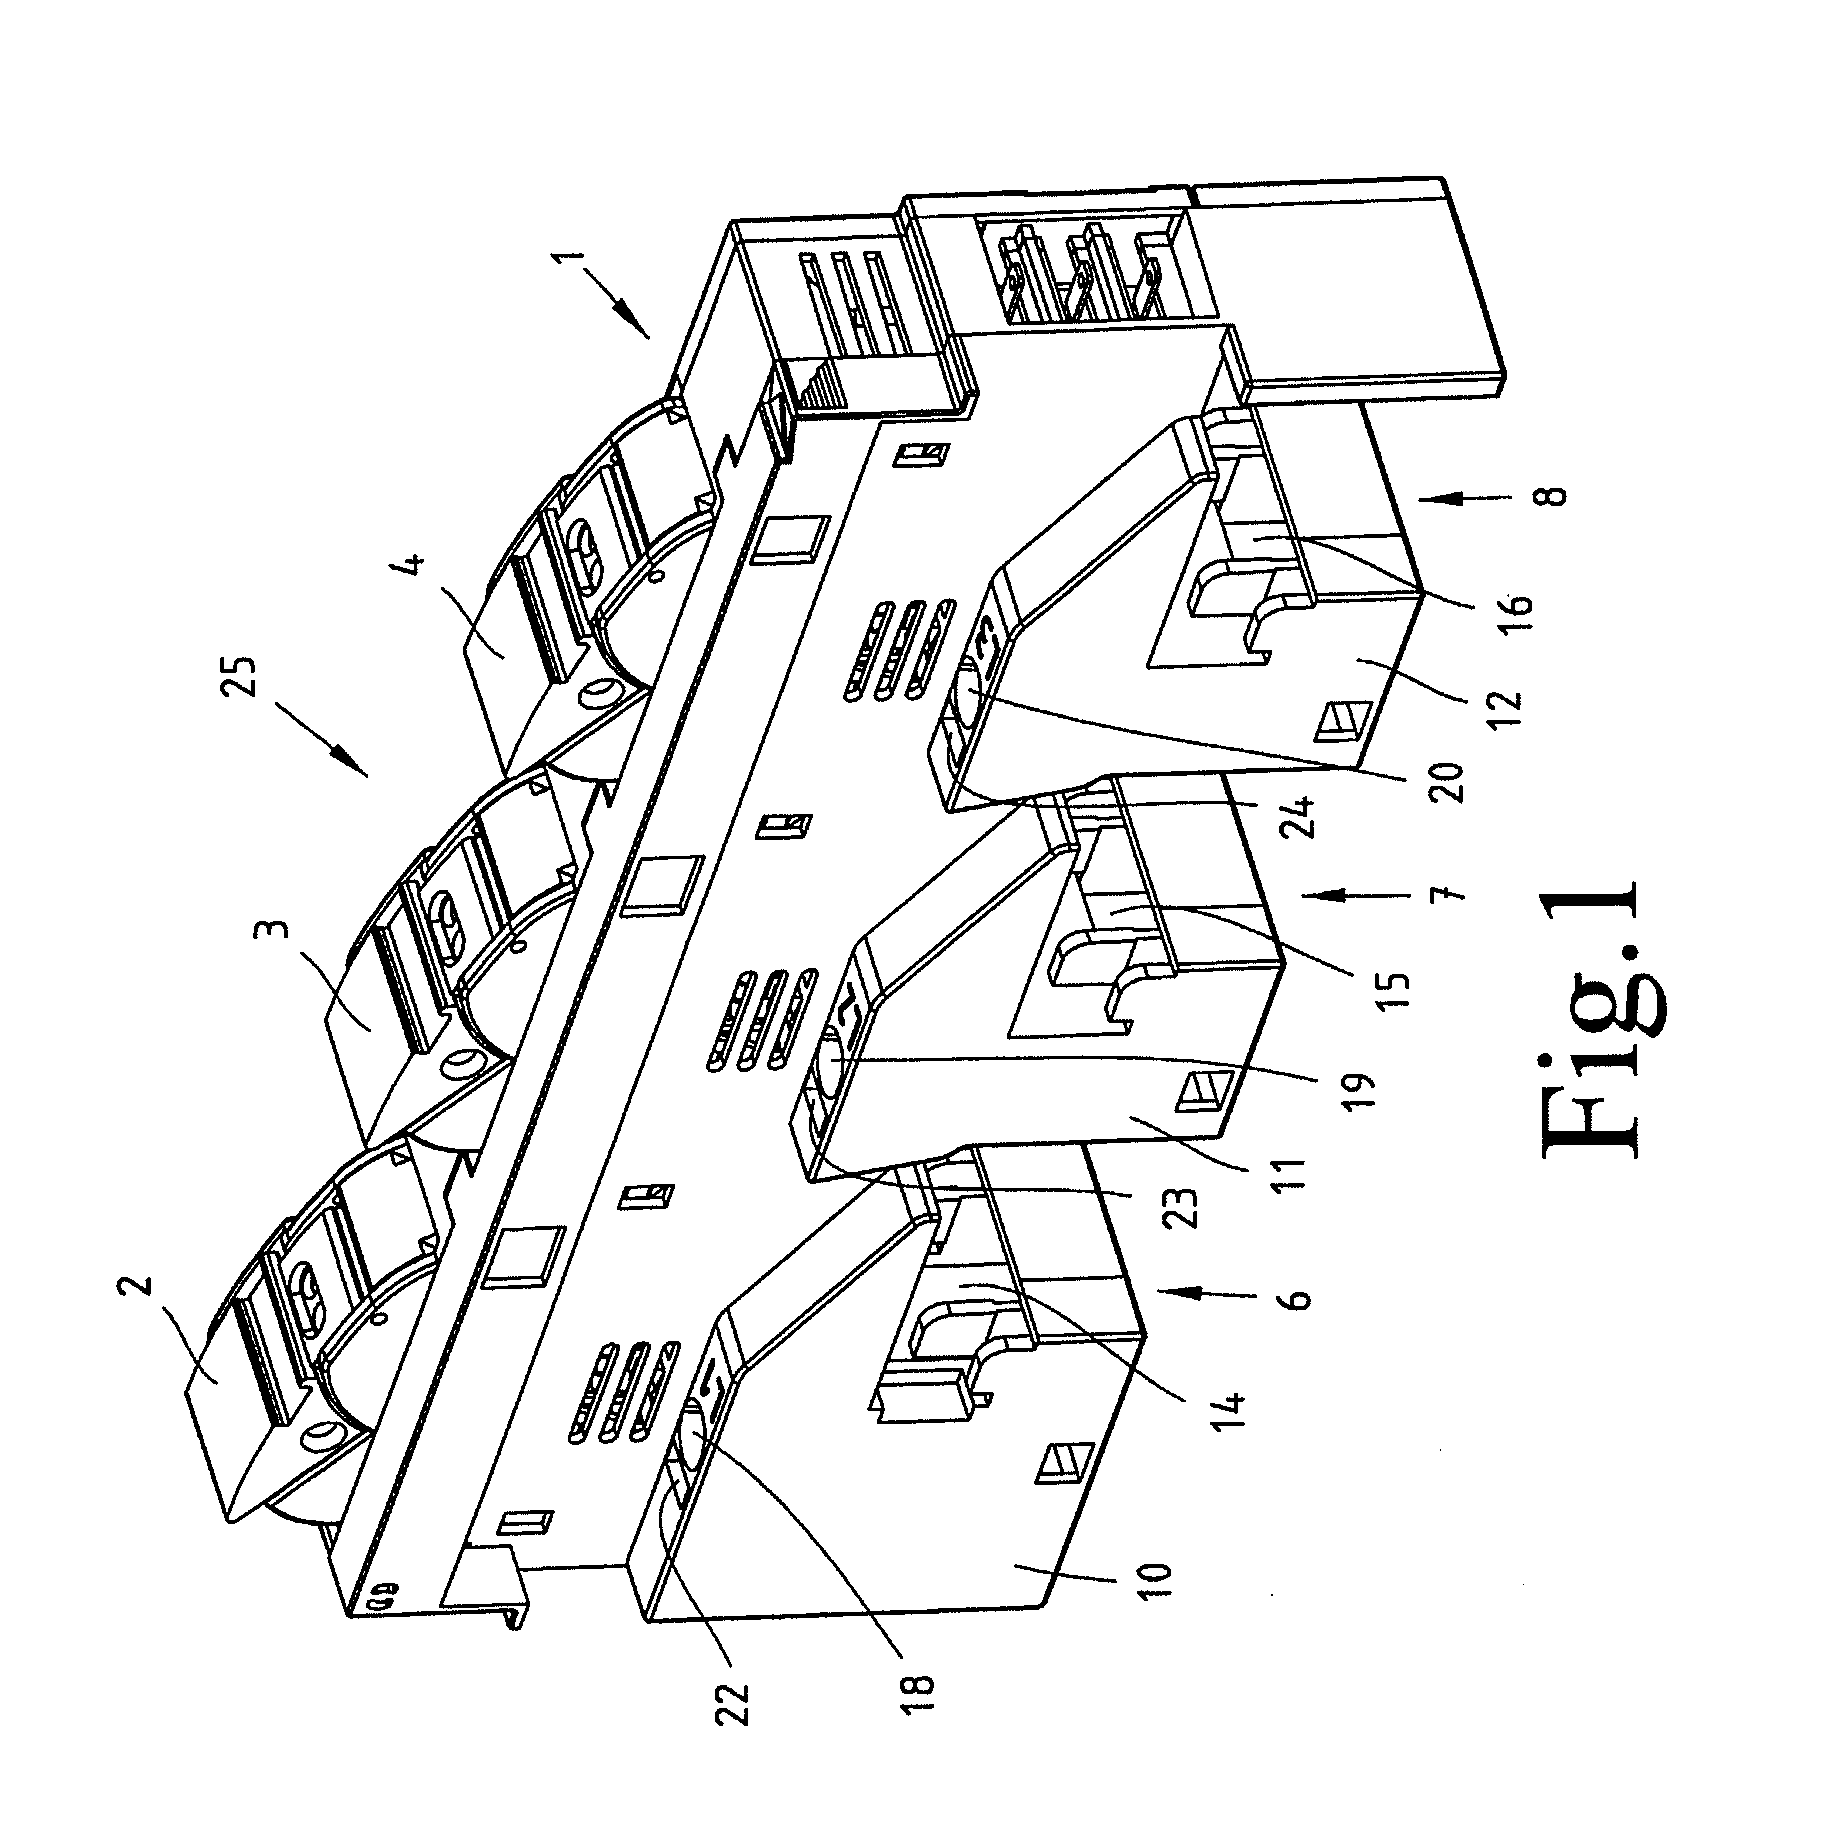 Patent Drawing: 12 Volt Fuse Box Enclosed At Chusao.net